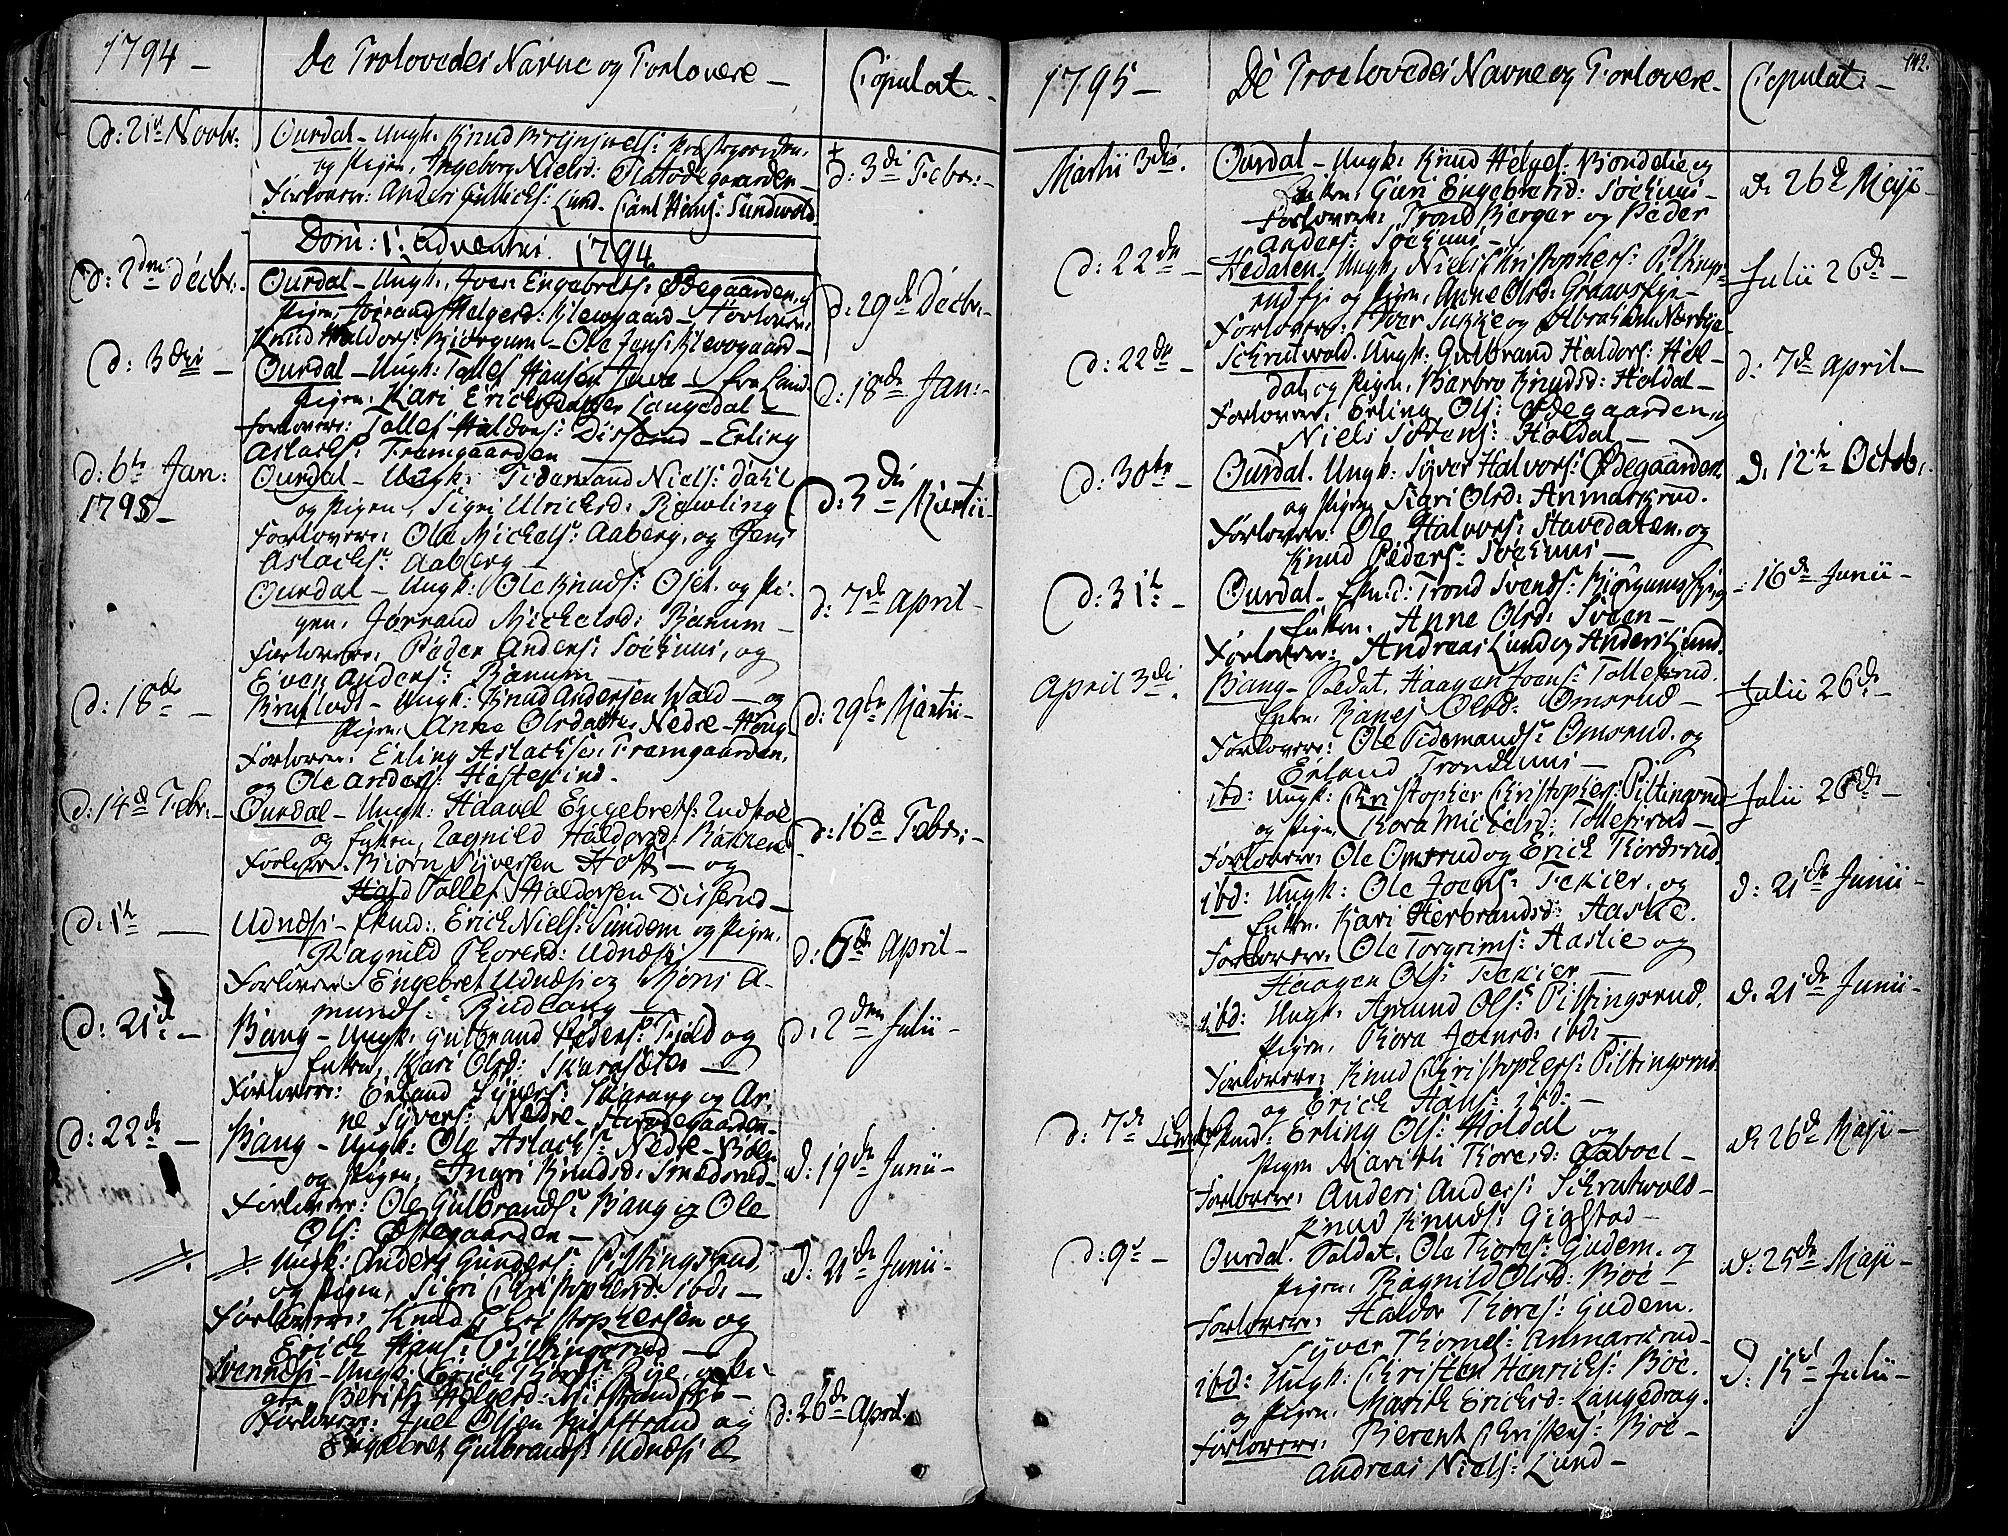 SAH, Aurdal prestekontor, Ministerialbok nr. 6, 1781-1804, s. 142